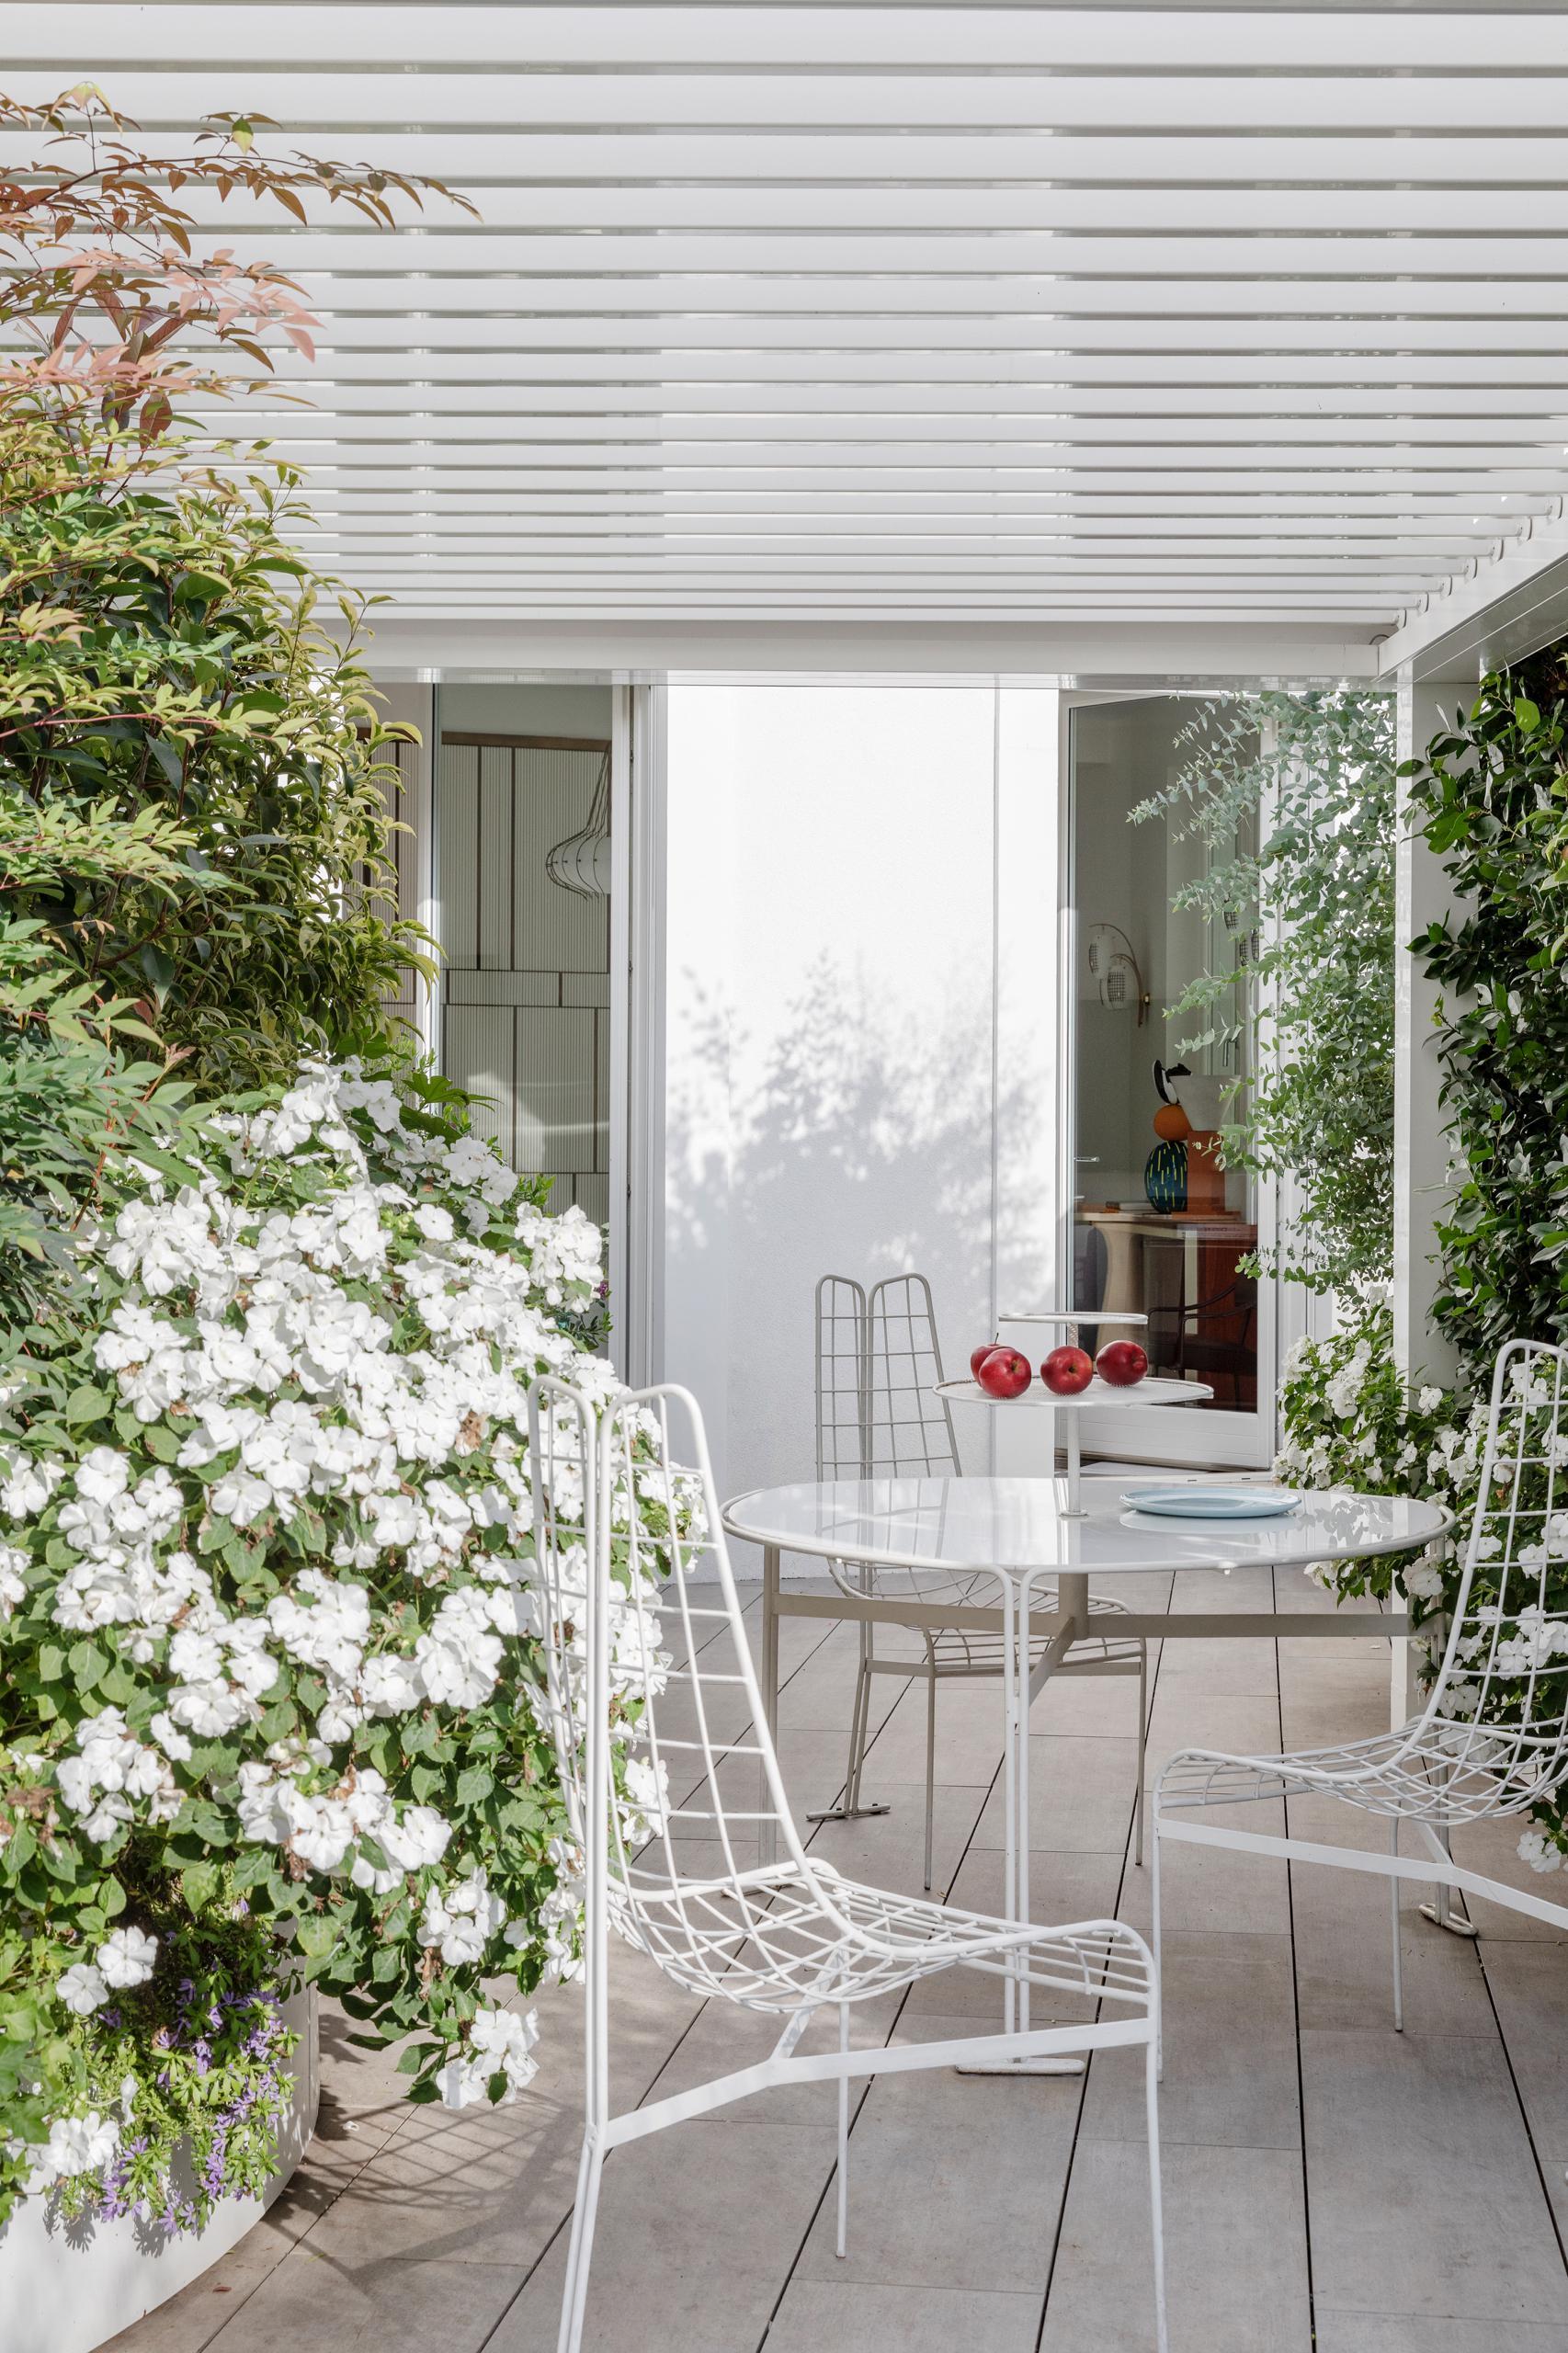 design-ideen-nilufar-gallery-mailand-homestory-decohome.de-terrasse-outdoormoebel